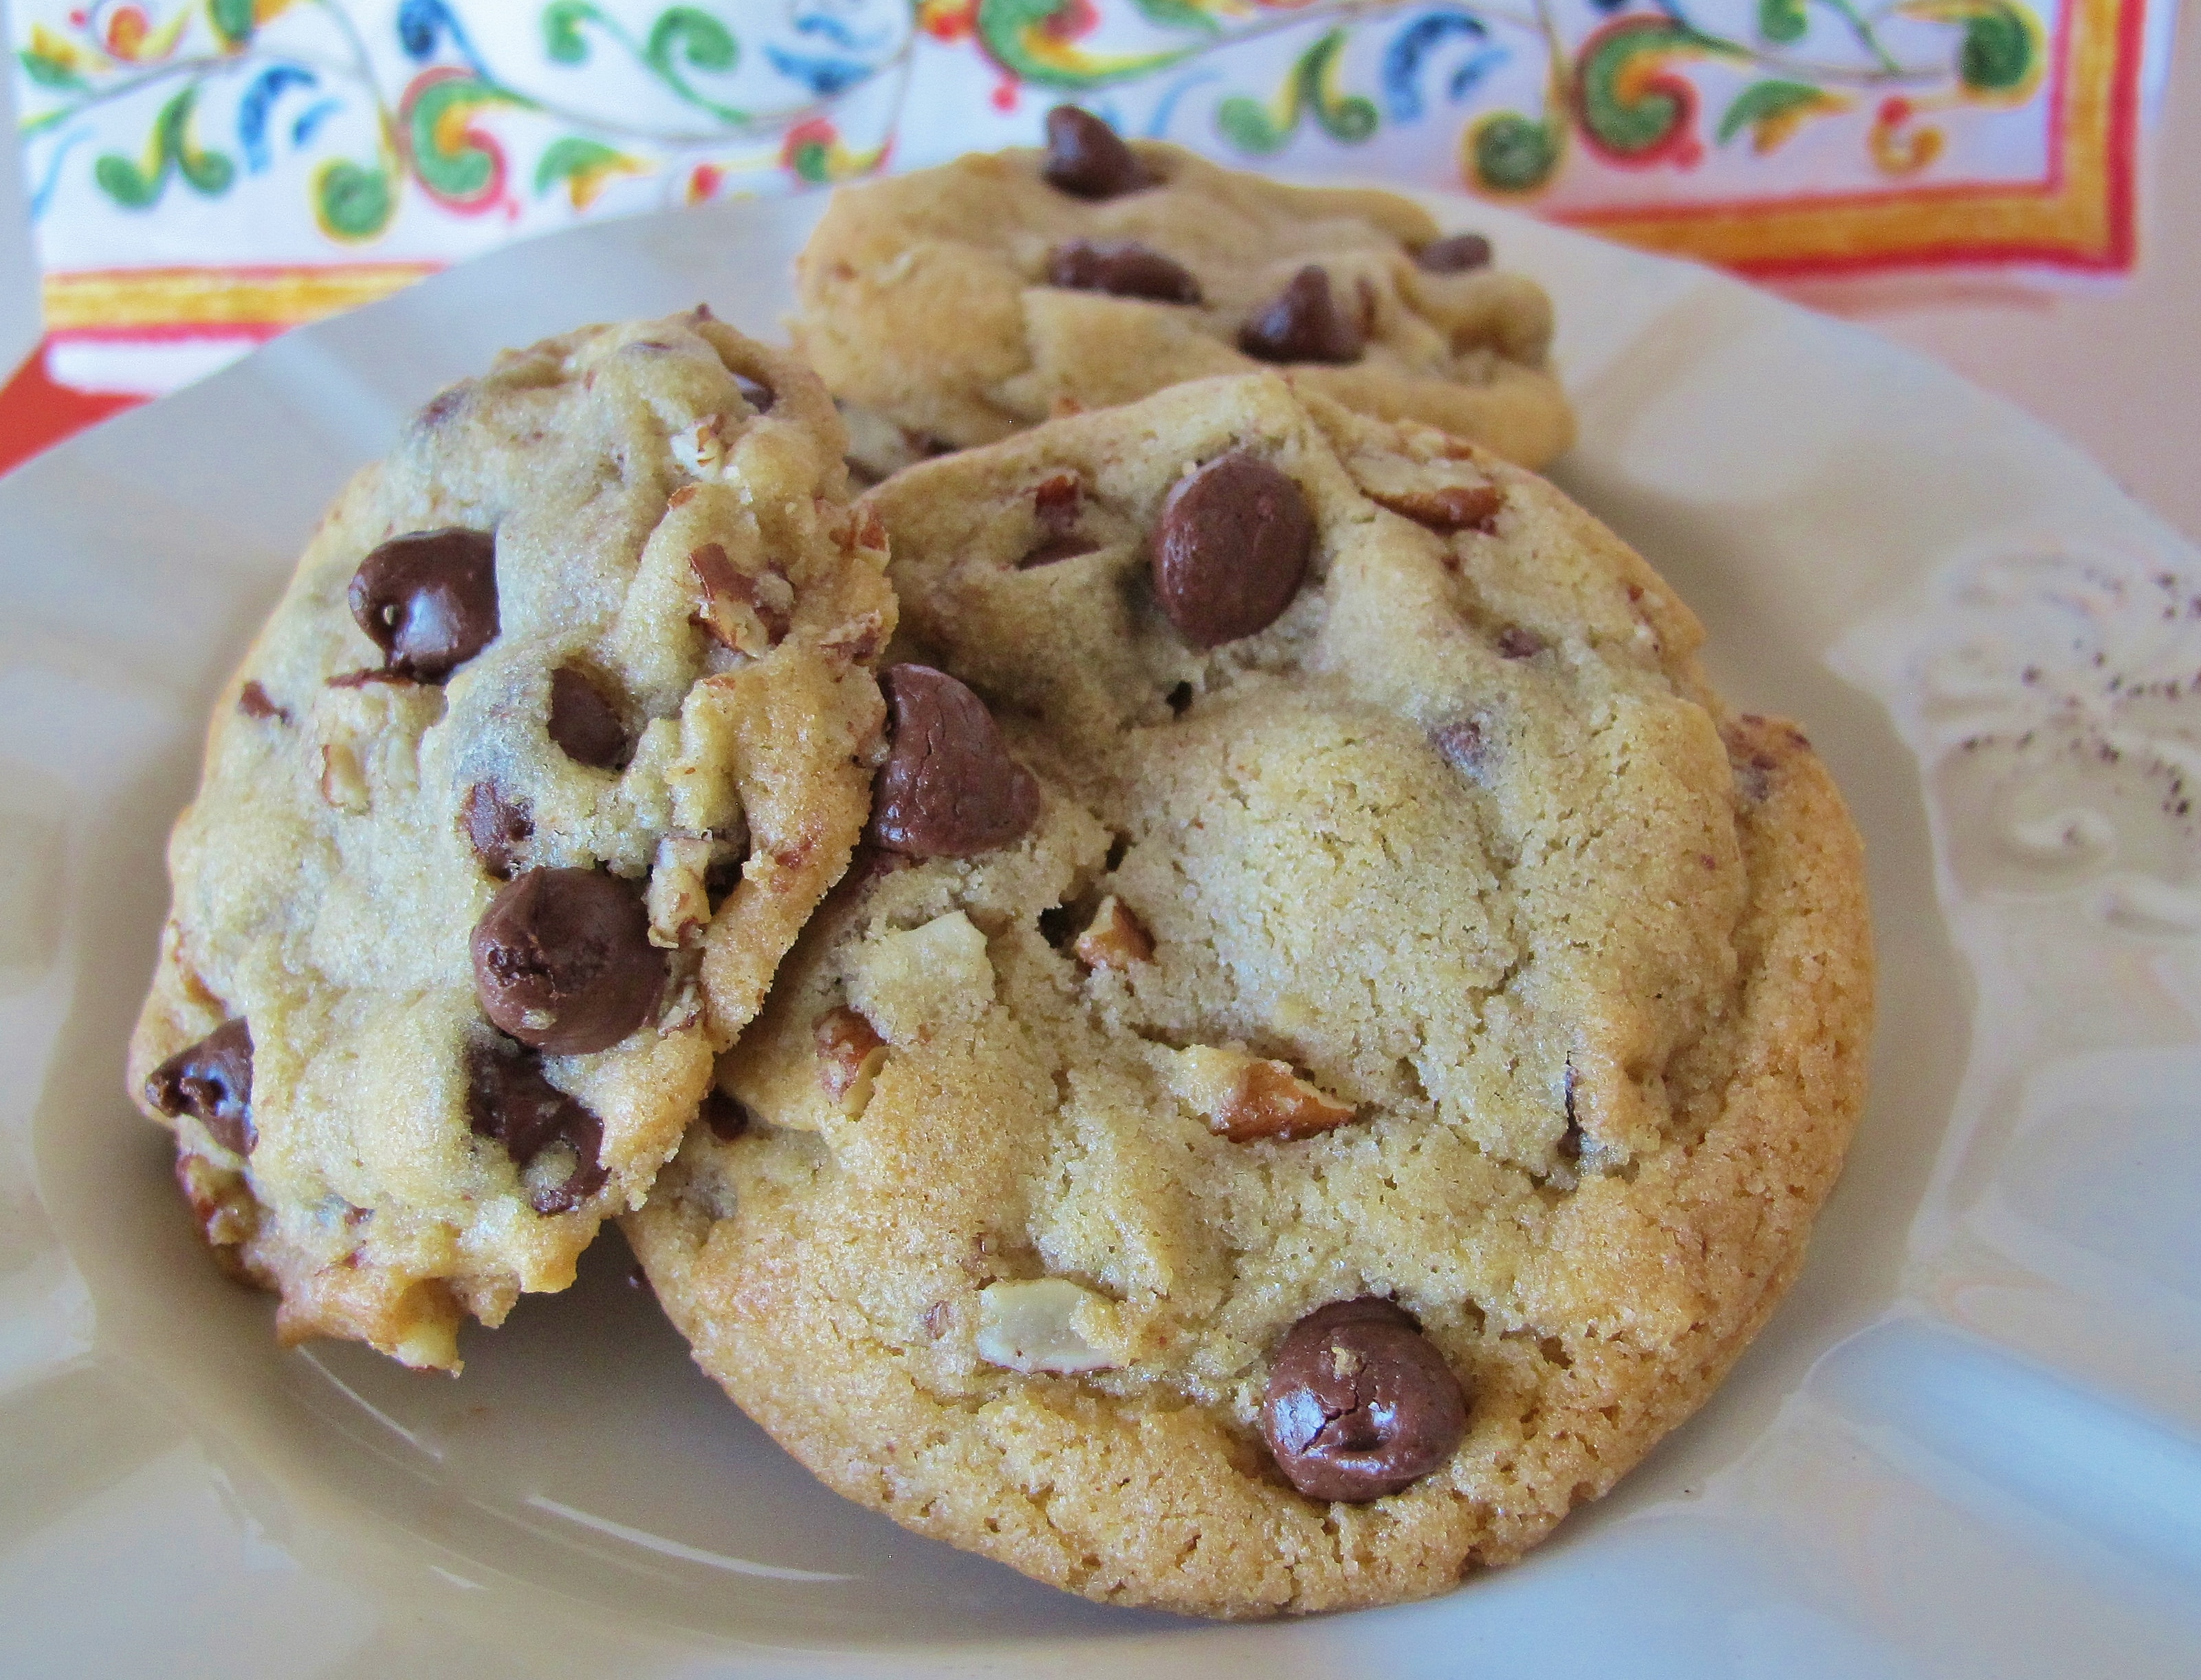 Vanilla Rich Chocolate Chip Cookies naples34102